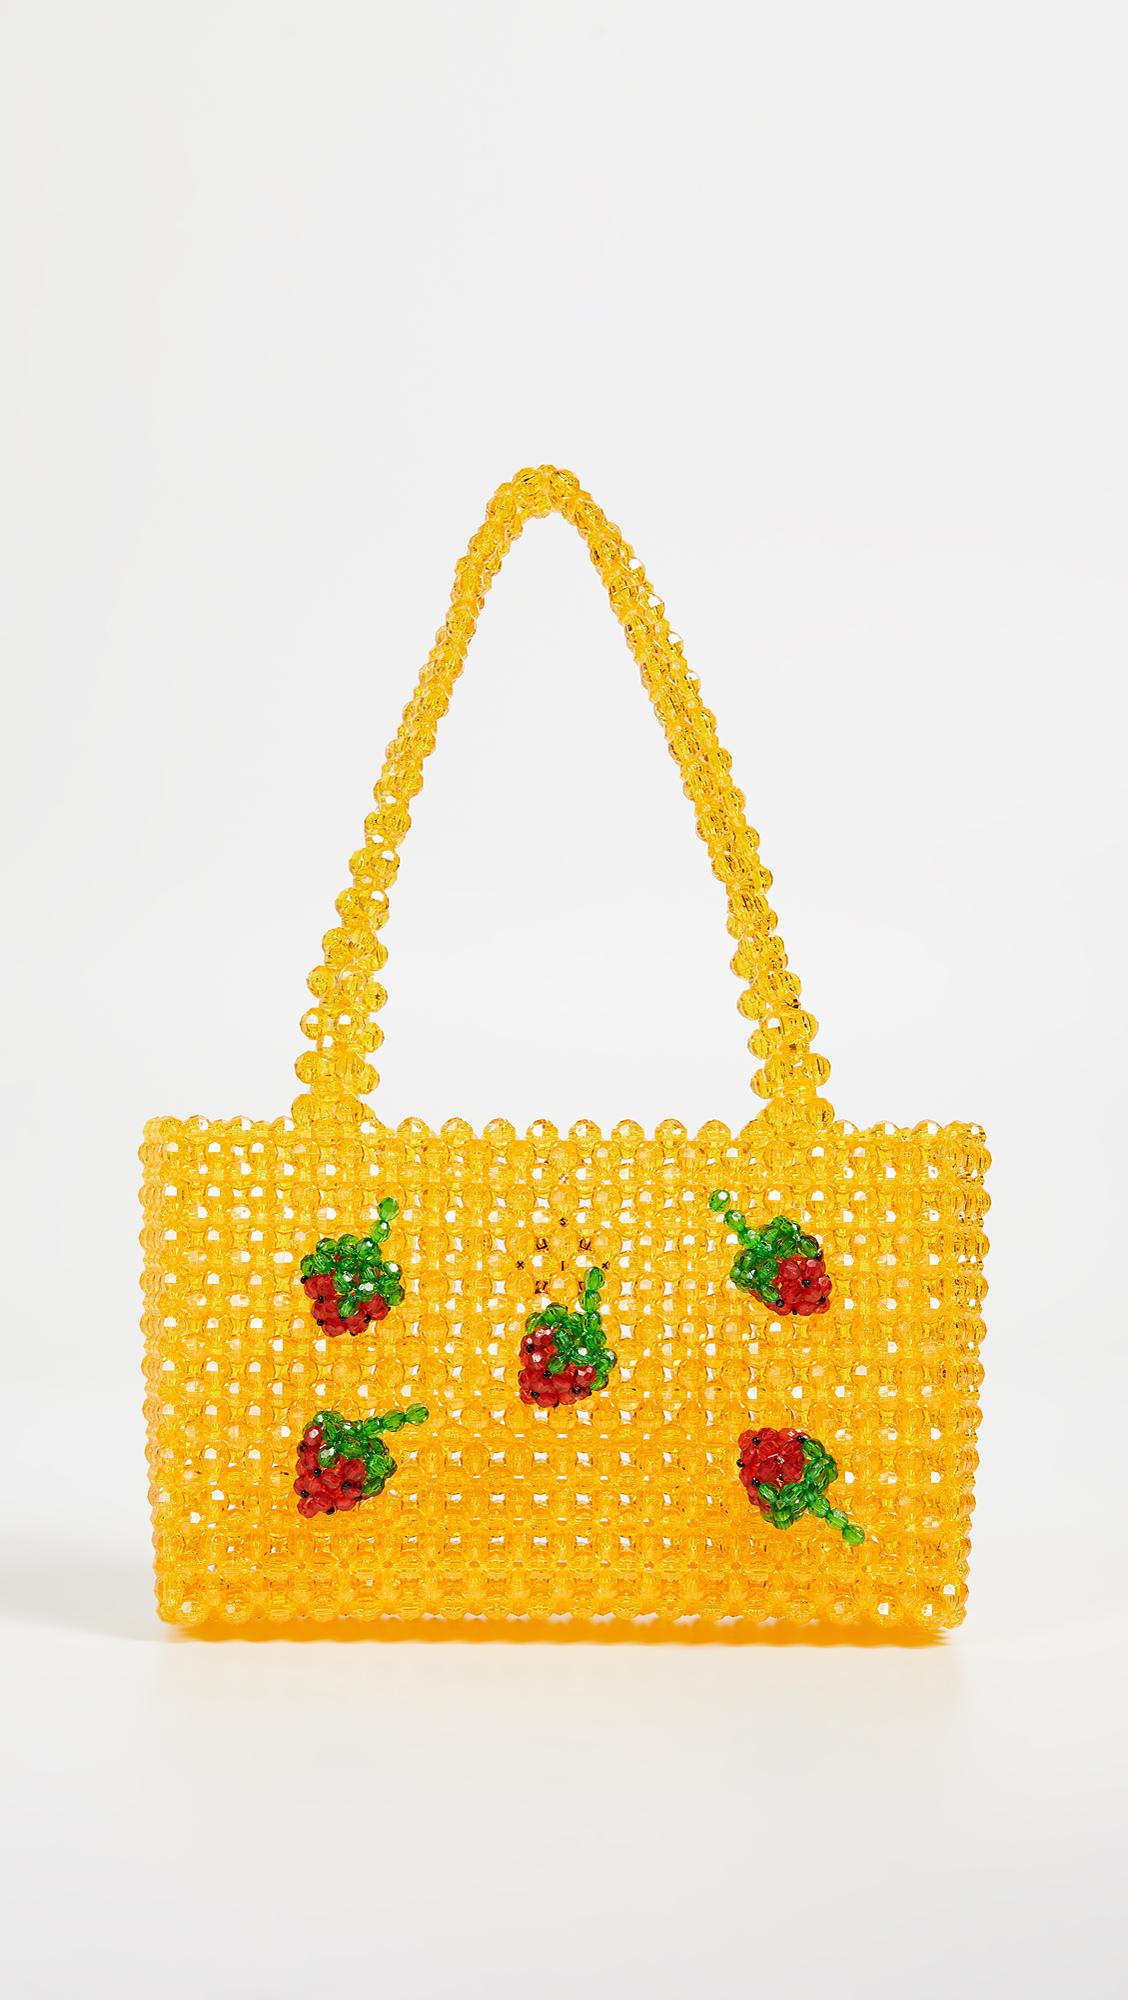 Super Cute Woven Beaded Bags by Susan Alexandra - Ichigo Bag